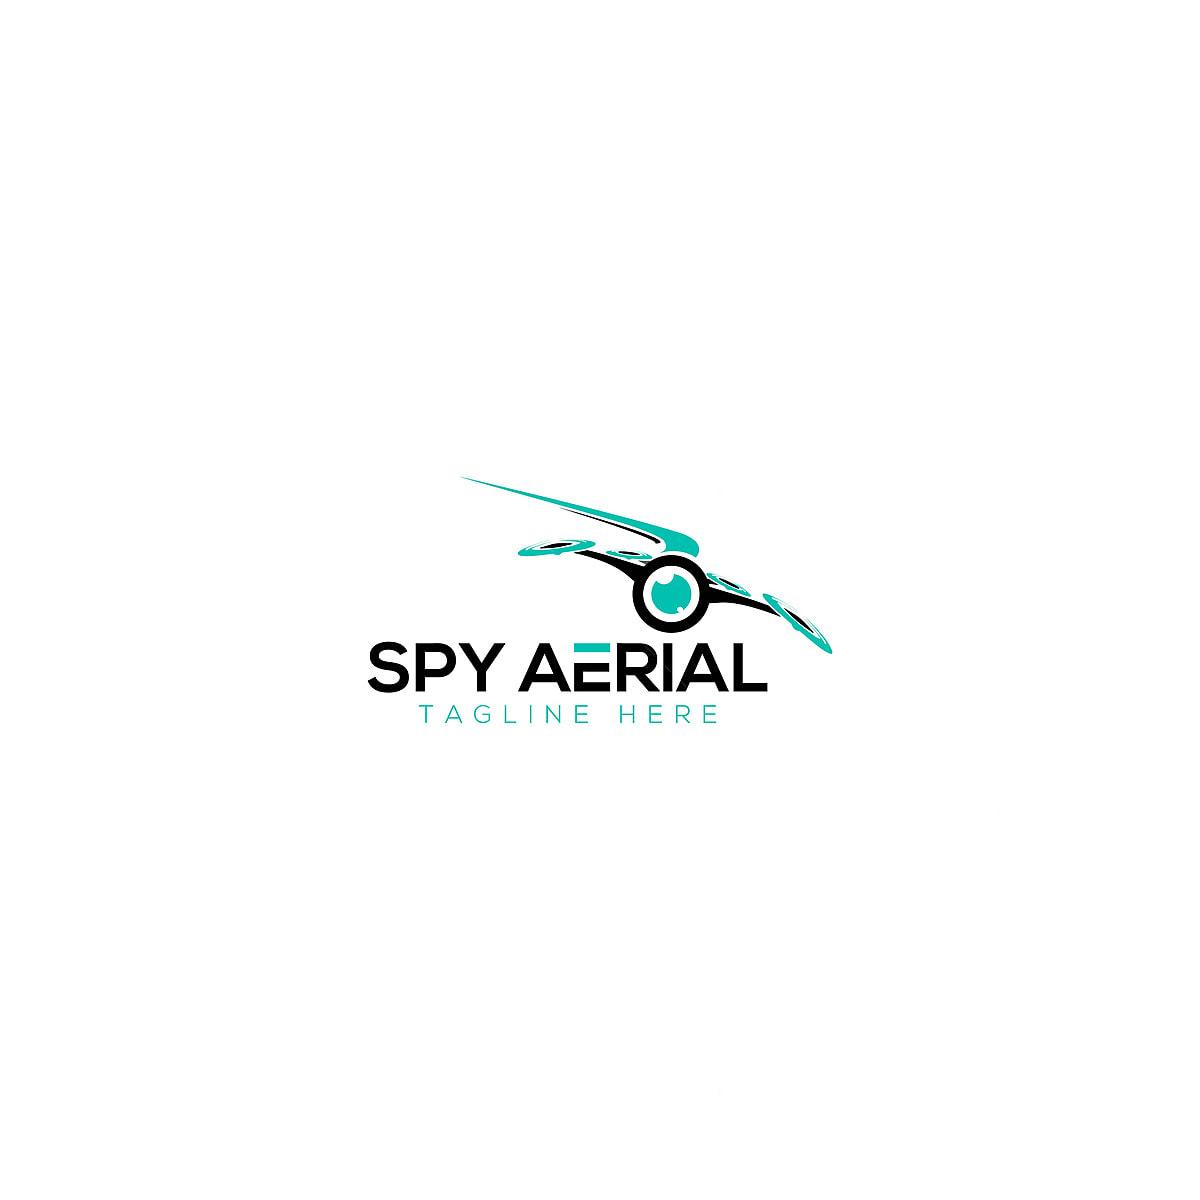 spy aerial and drone logo design template for free download on pngtree spy aerial and drone logo design